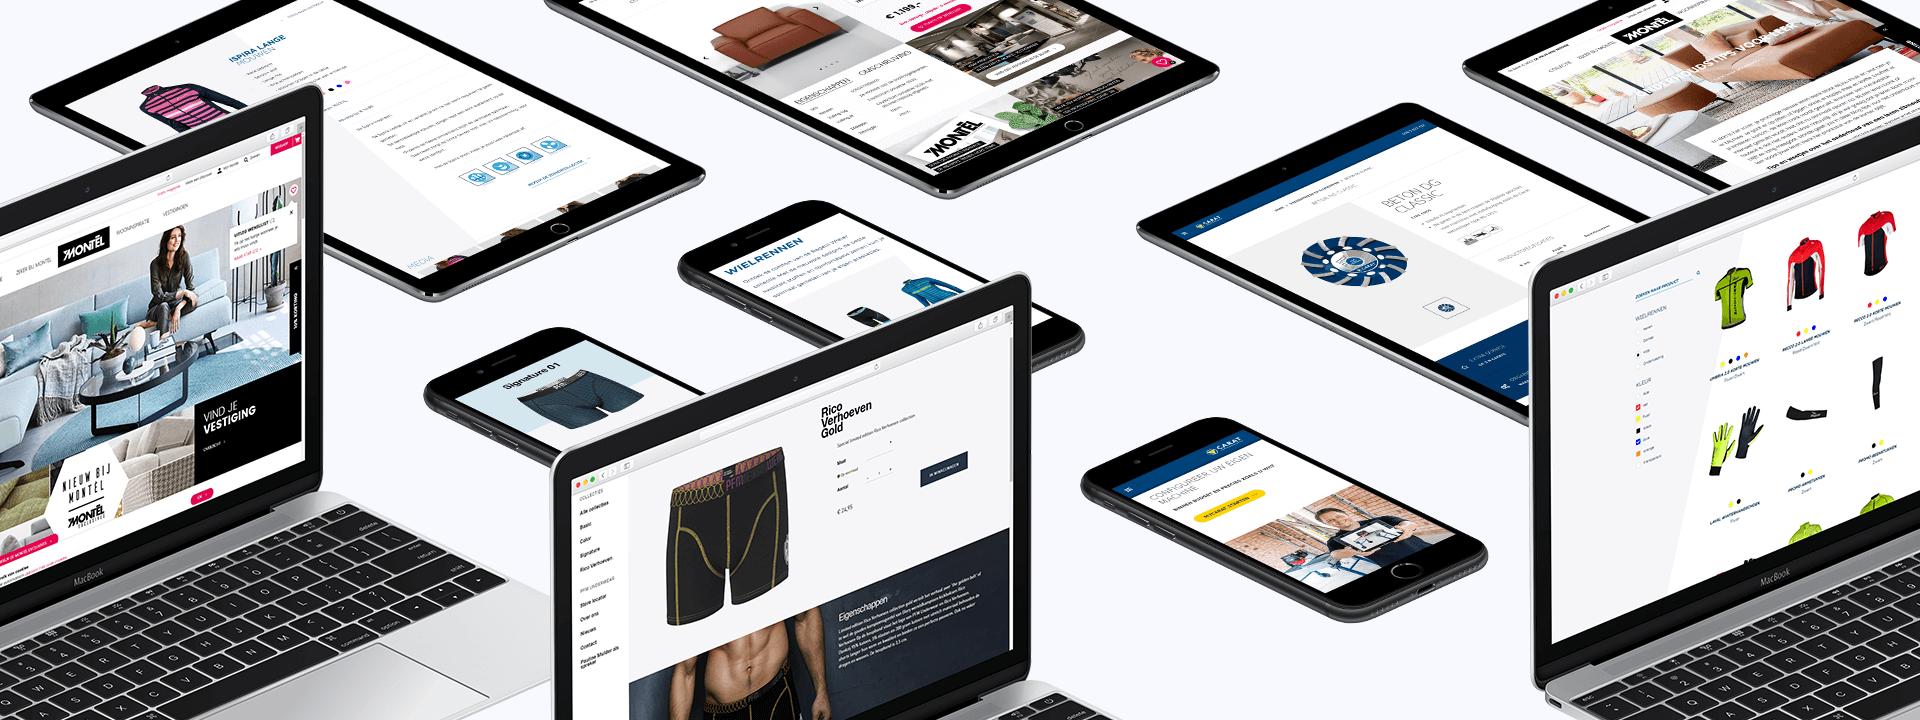 Webshop ontwikkeling Breda